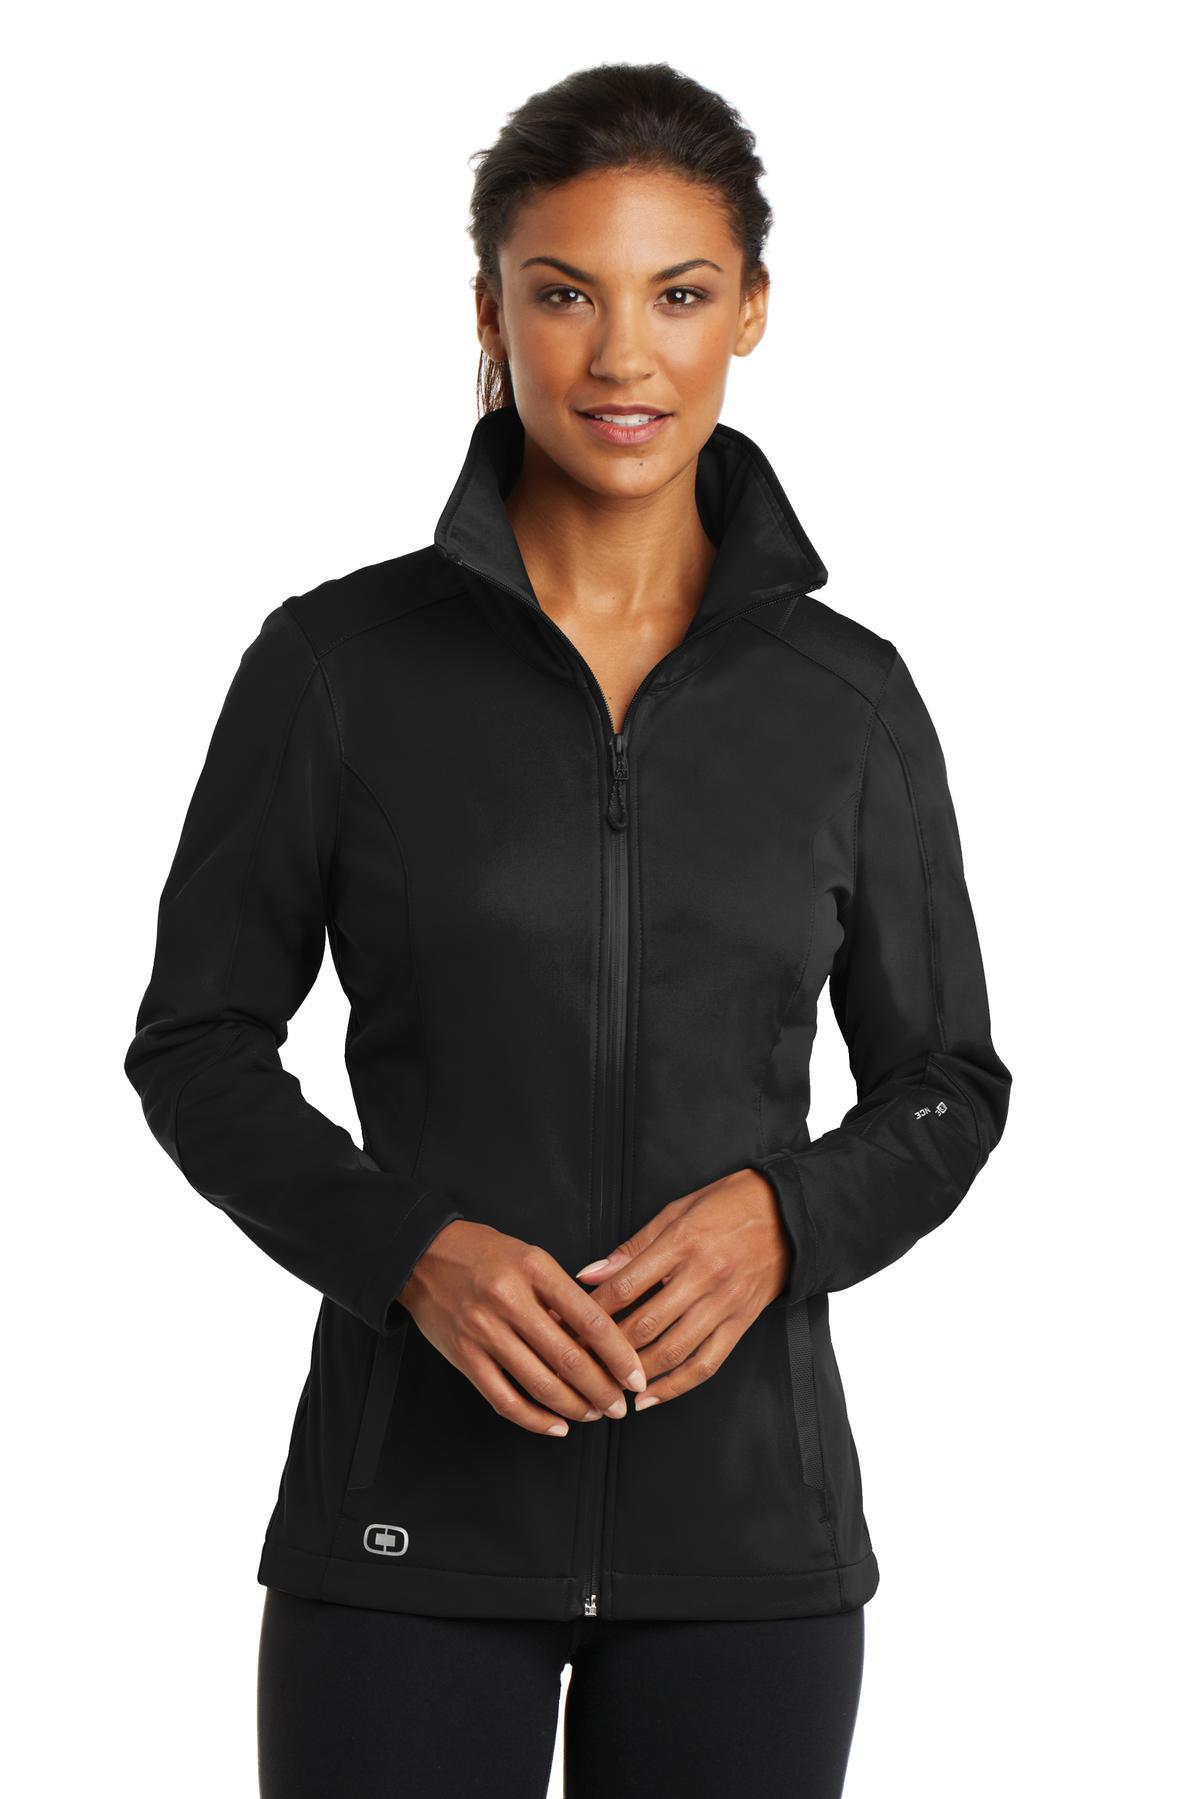 OGIO® LOE720 ENDURANCE系列 女士防风保暖修身软壳外套